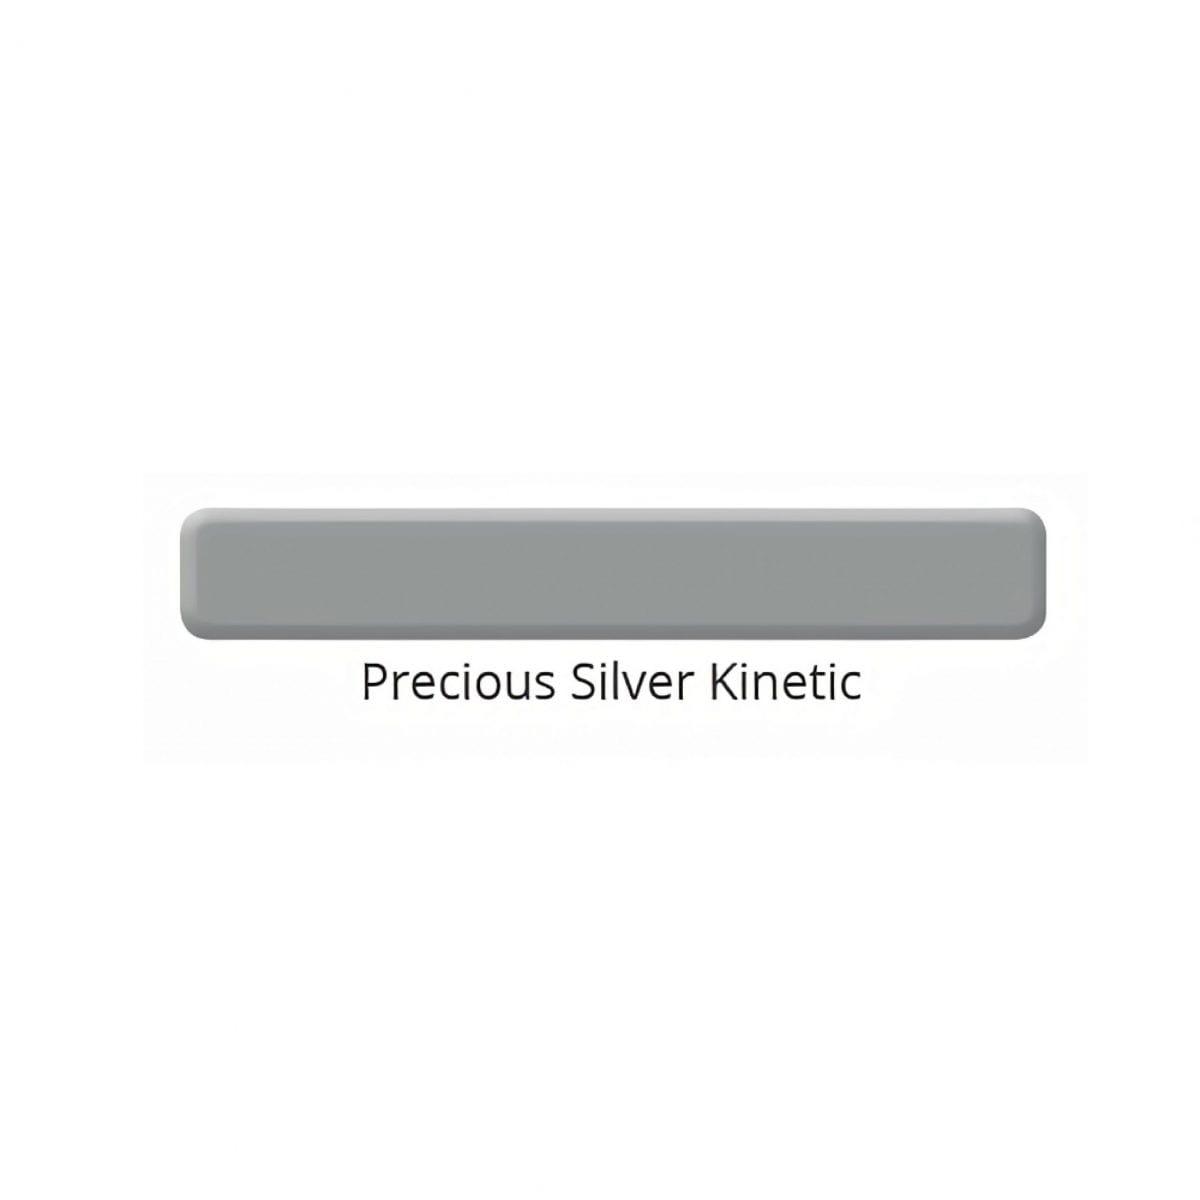 Precious Silver Kinetic color